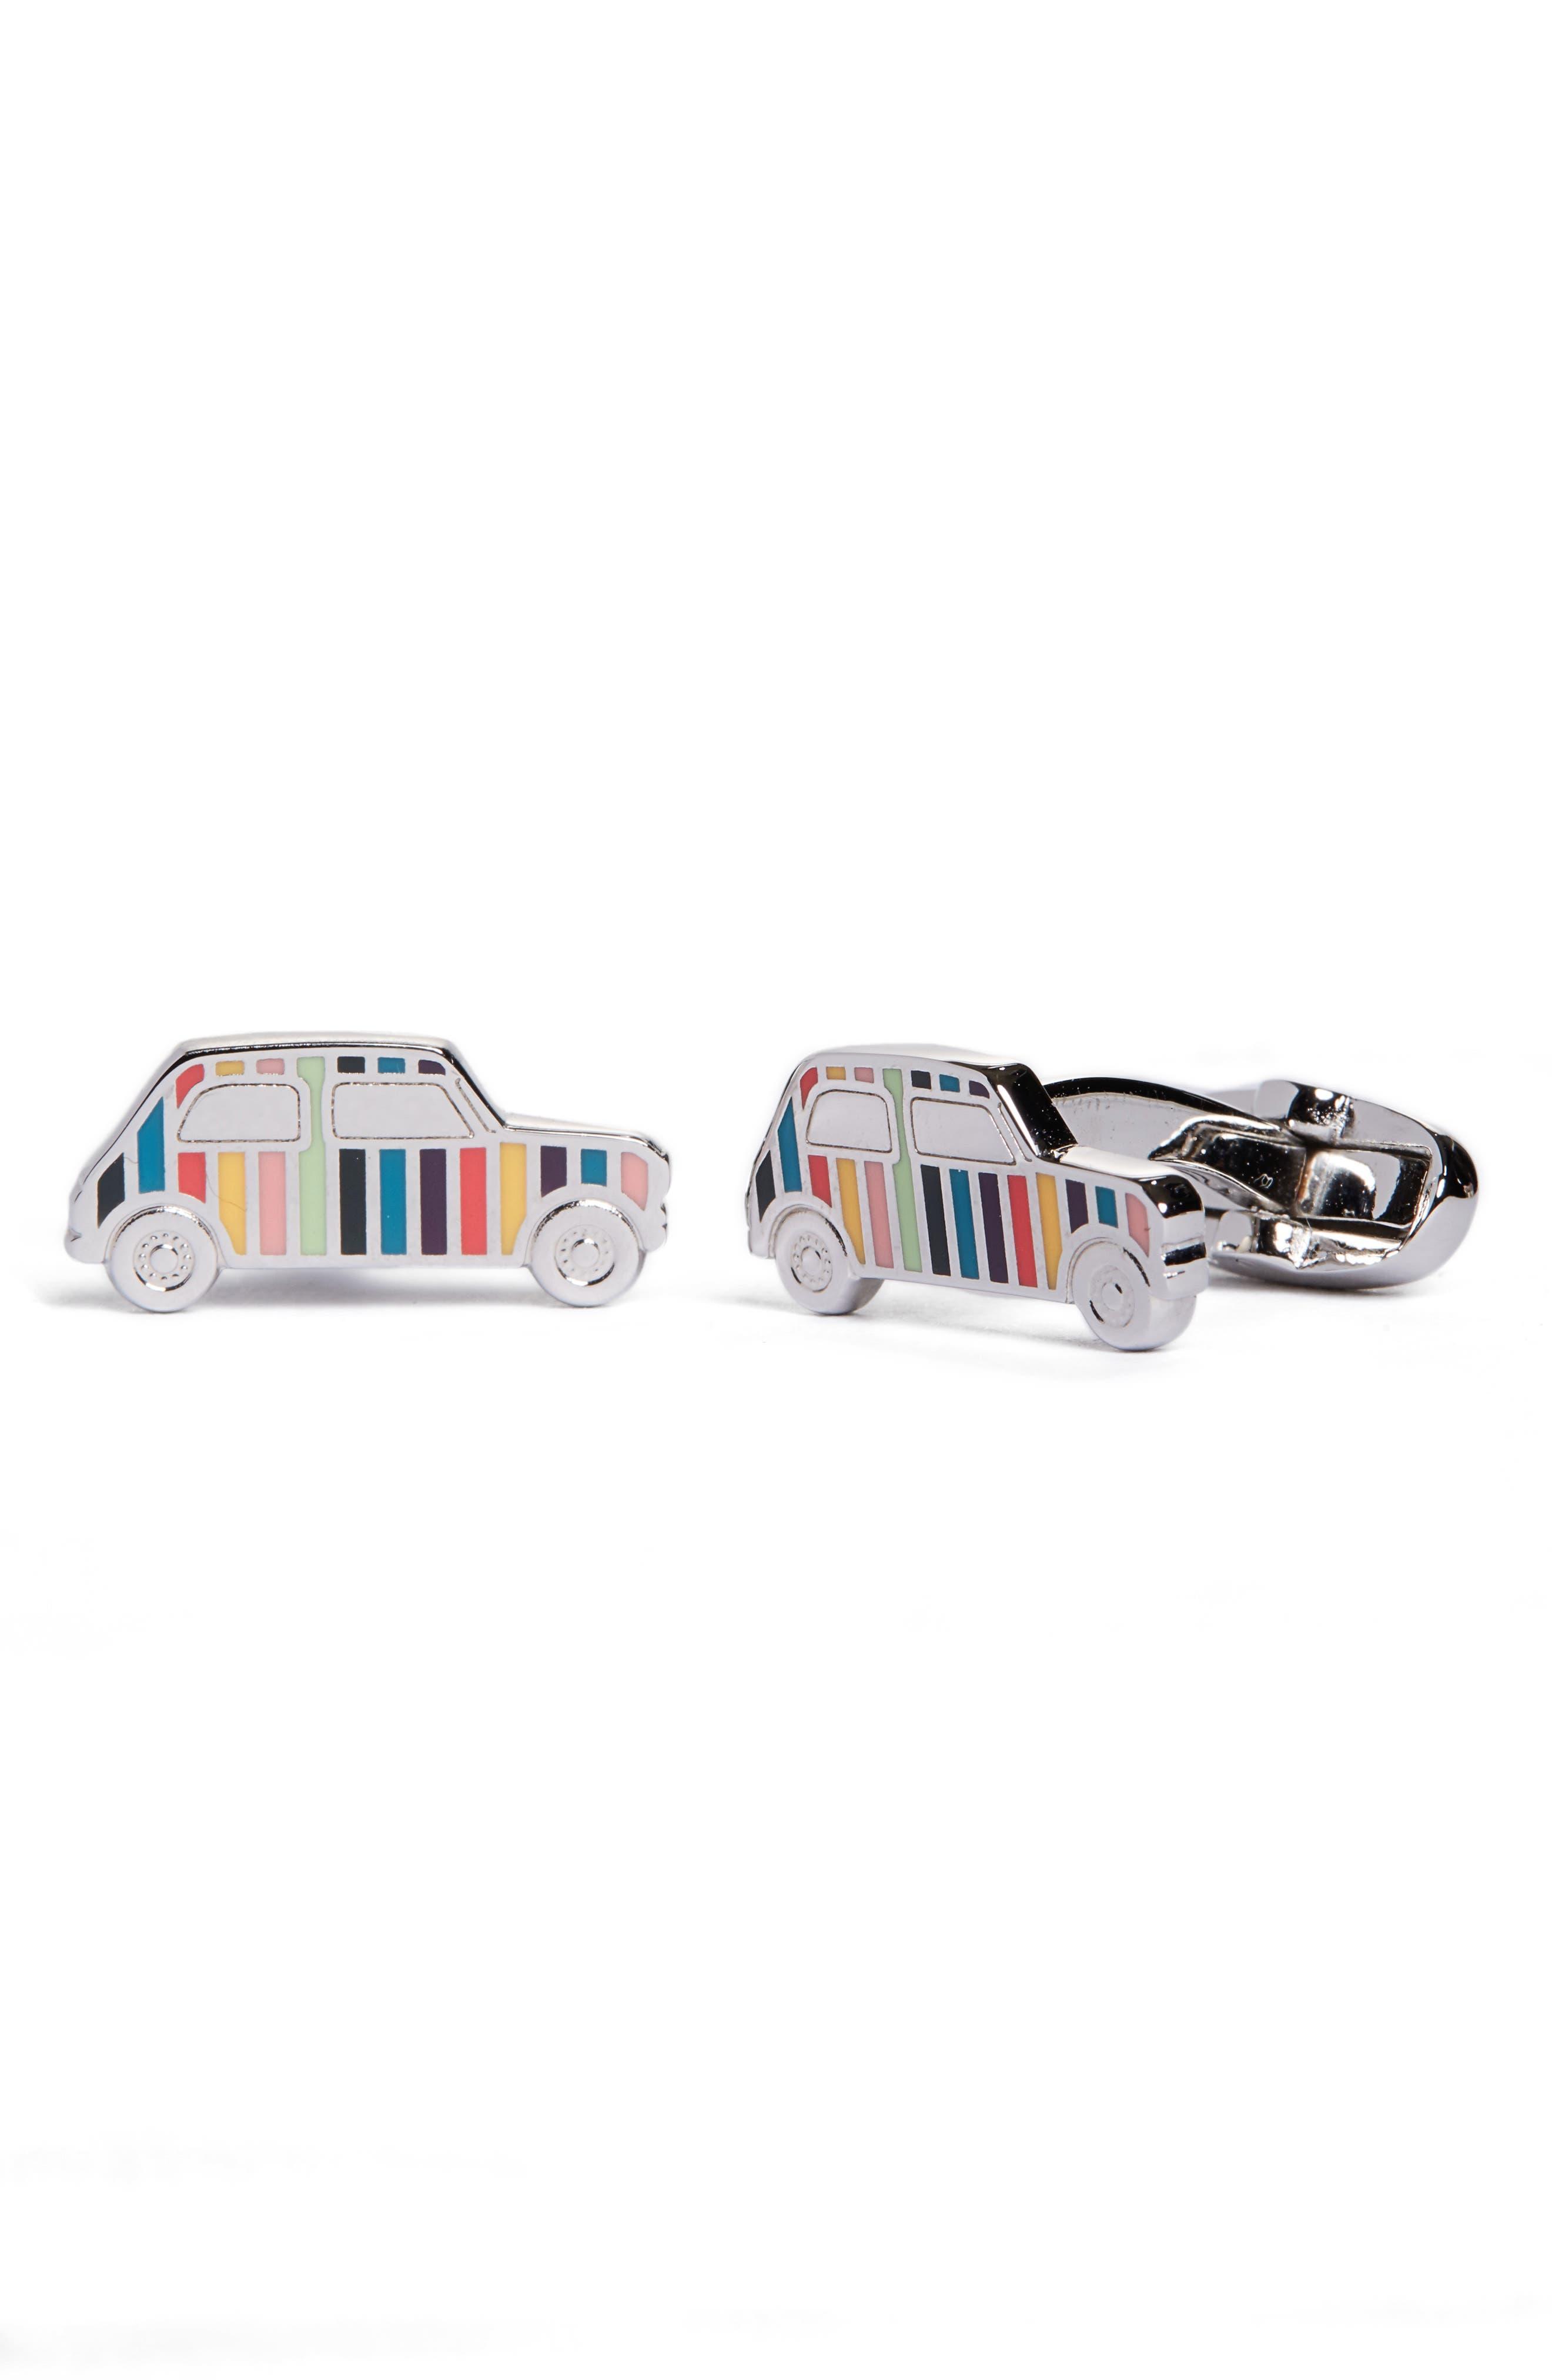 Alternate Image 1 Selected - Paul Smith Enamel Stripe Car Cuff Links